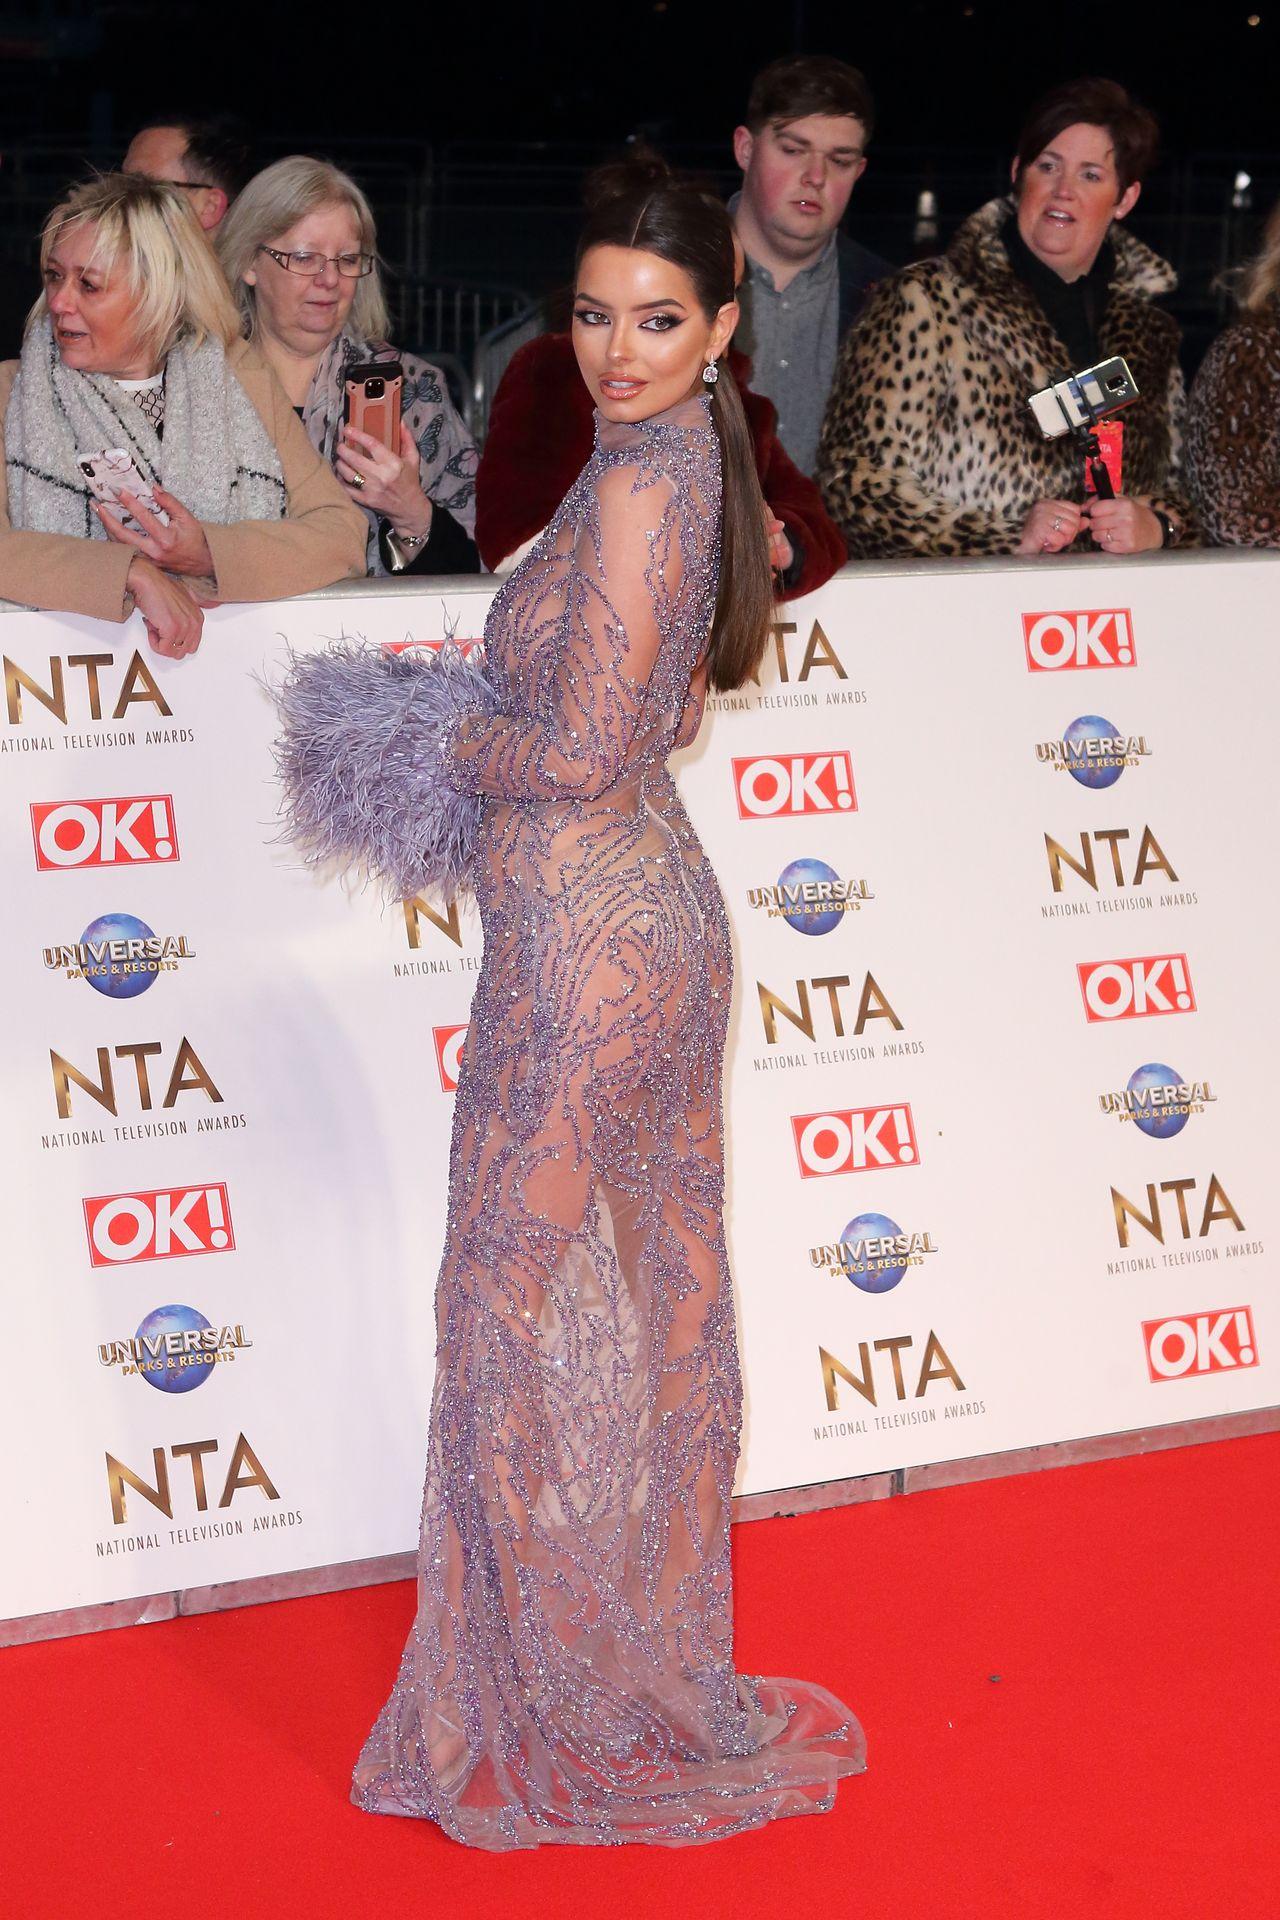 Maura Higgins Looks Hot At The National Television Awards 0012